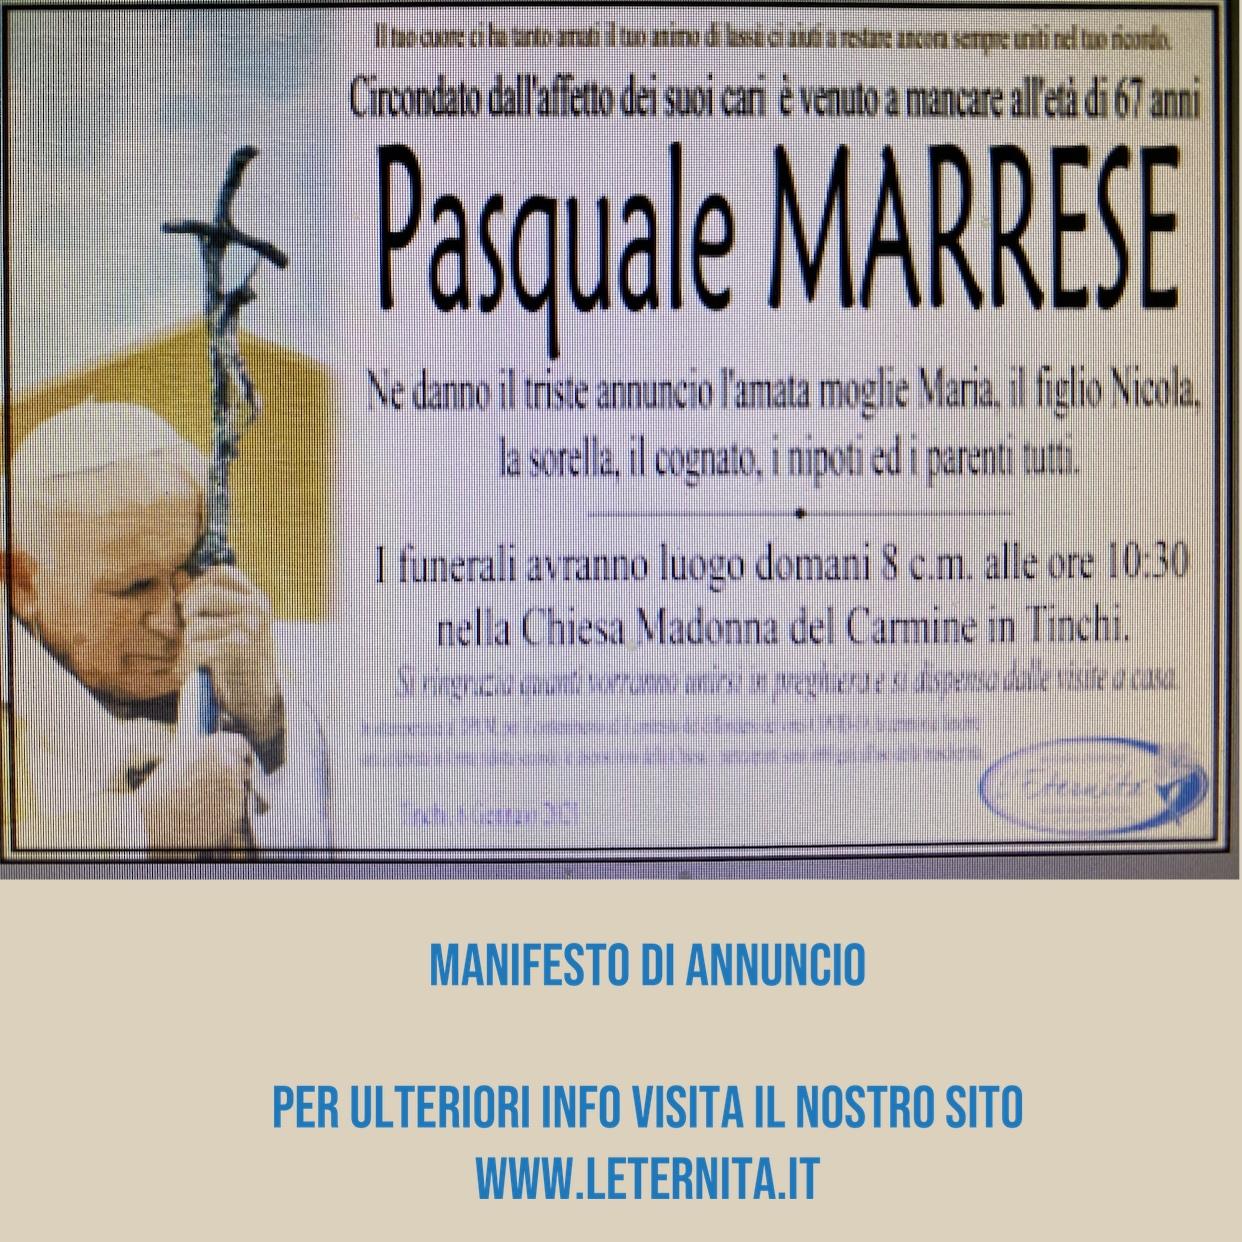 Pasquale MARRESE